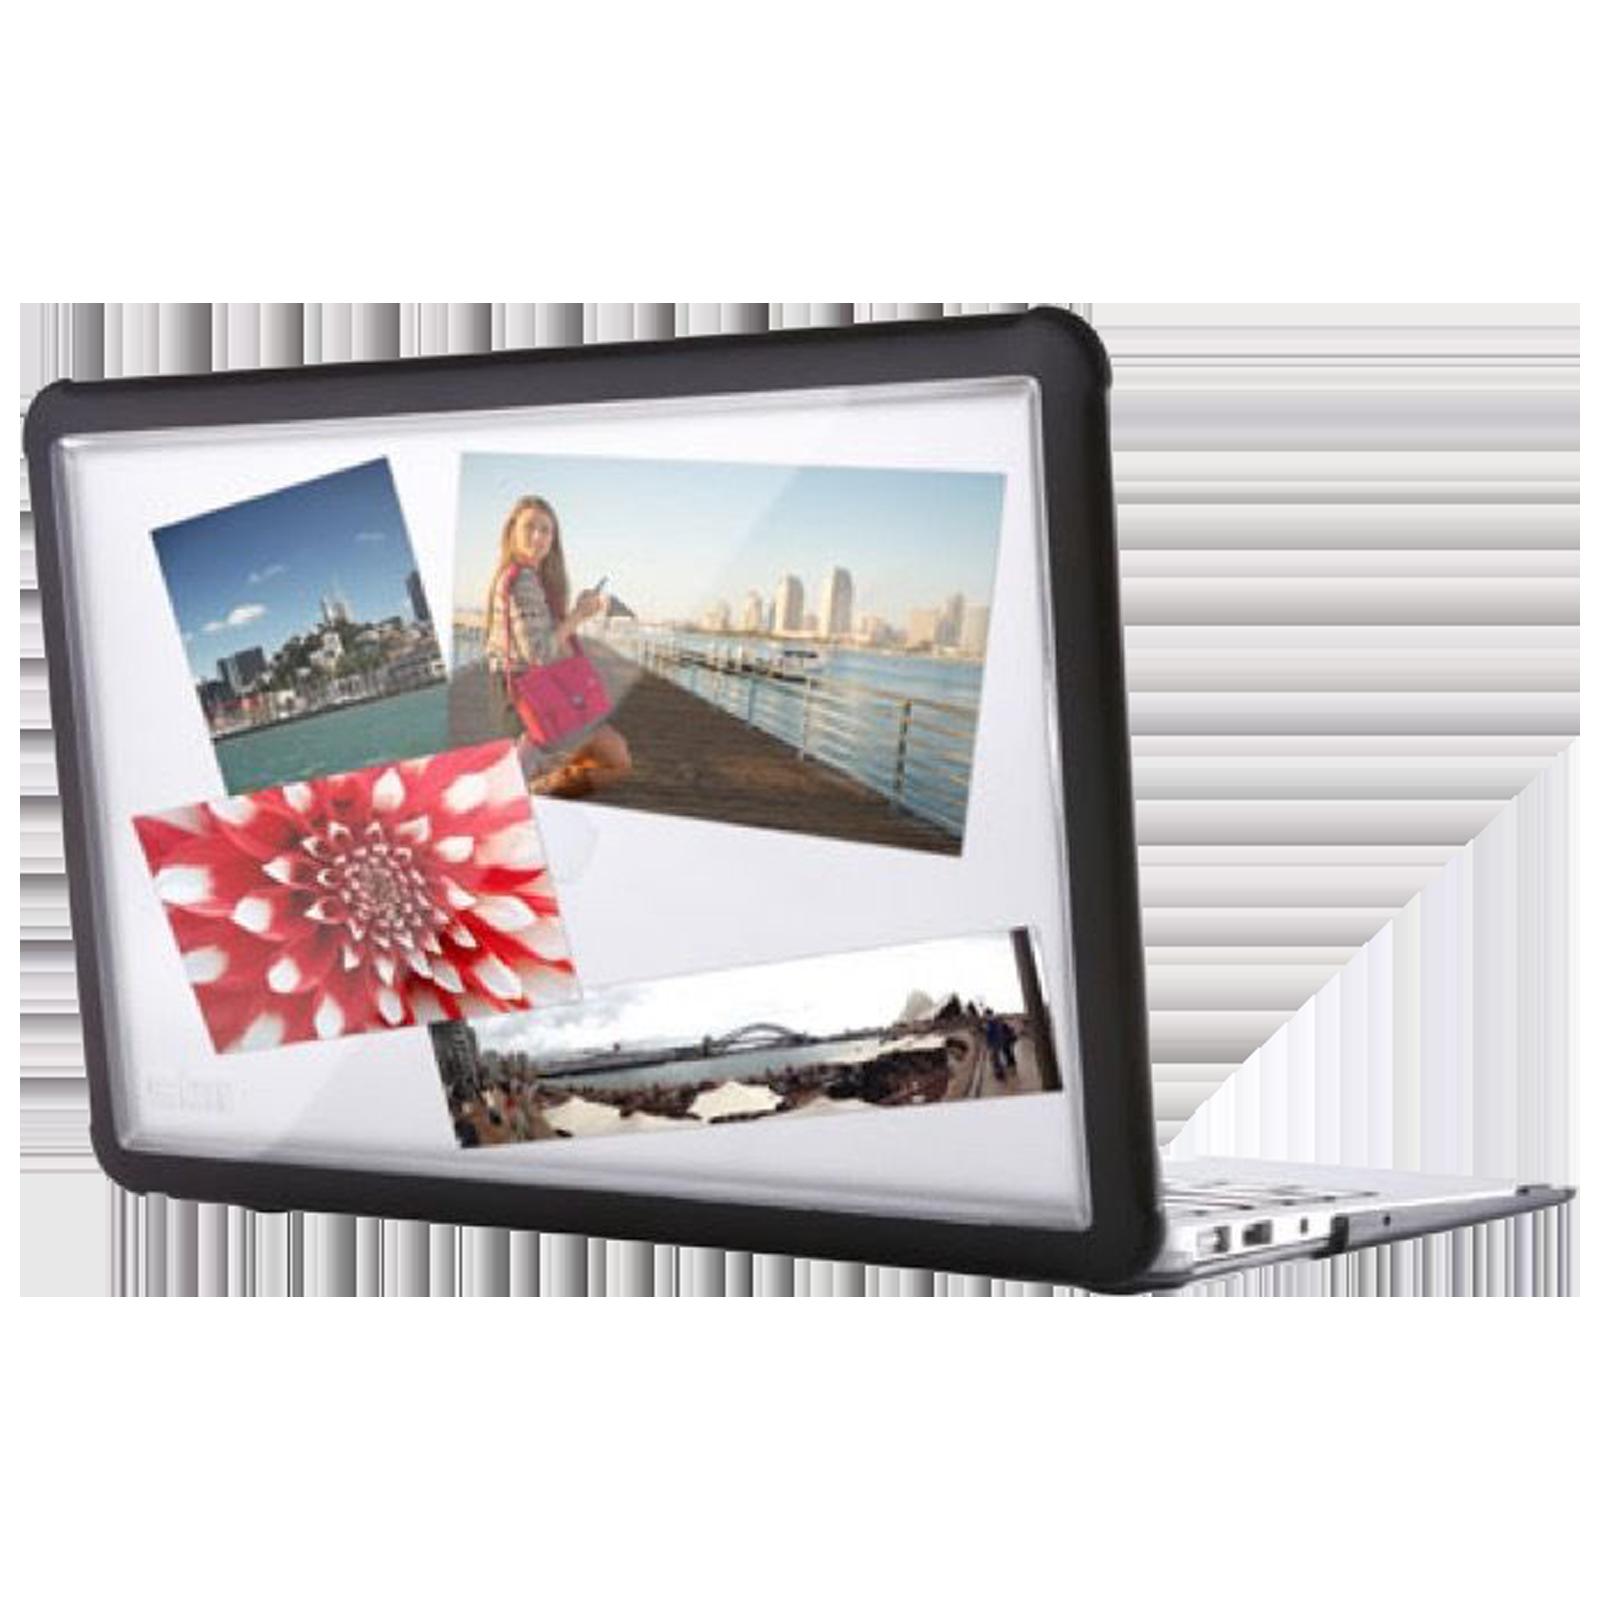 STM Dux Laptop Case For MacBook Air 13 Inch (Textured Rubber Feet, STM-122-293MW-01, Black)_1